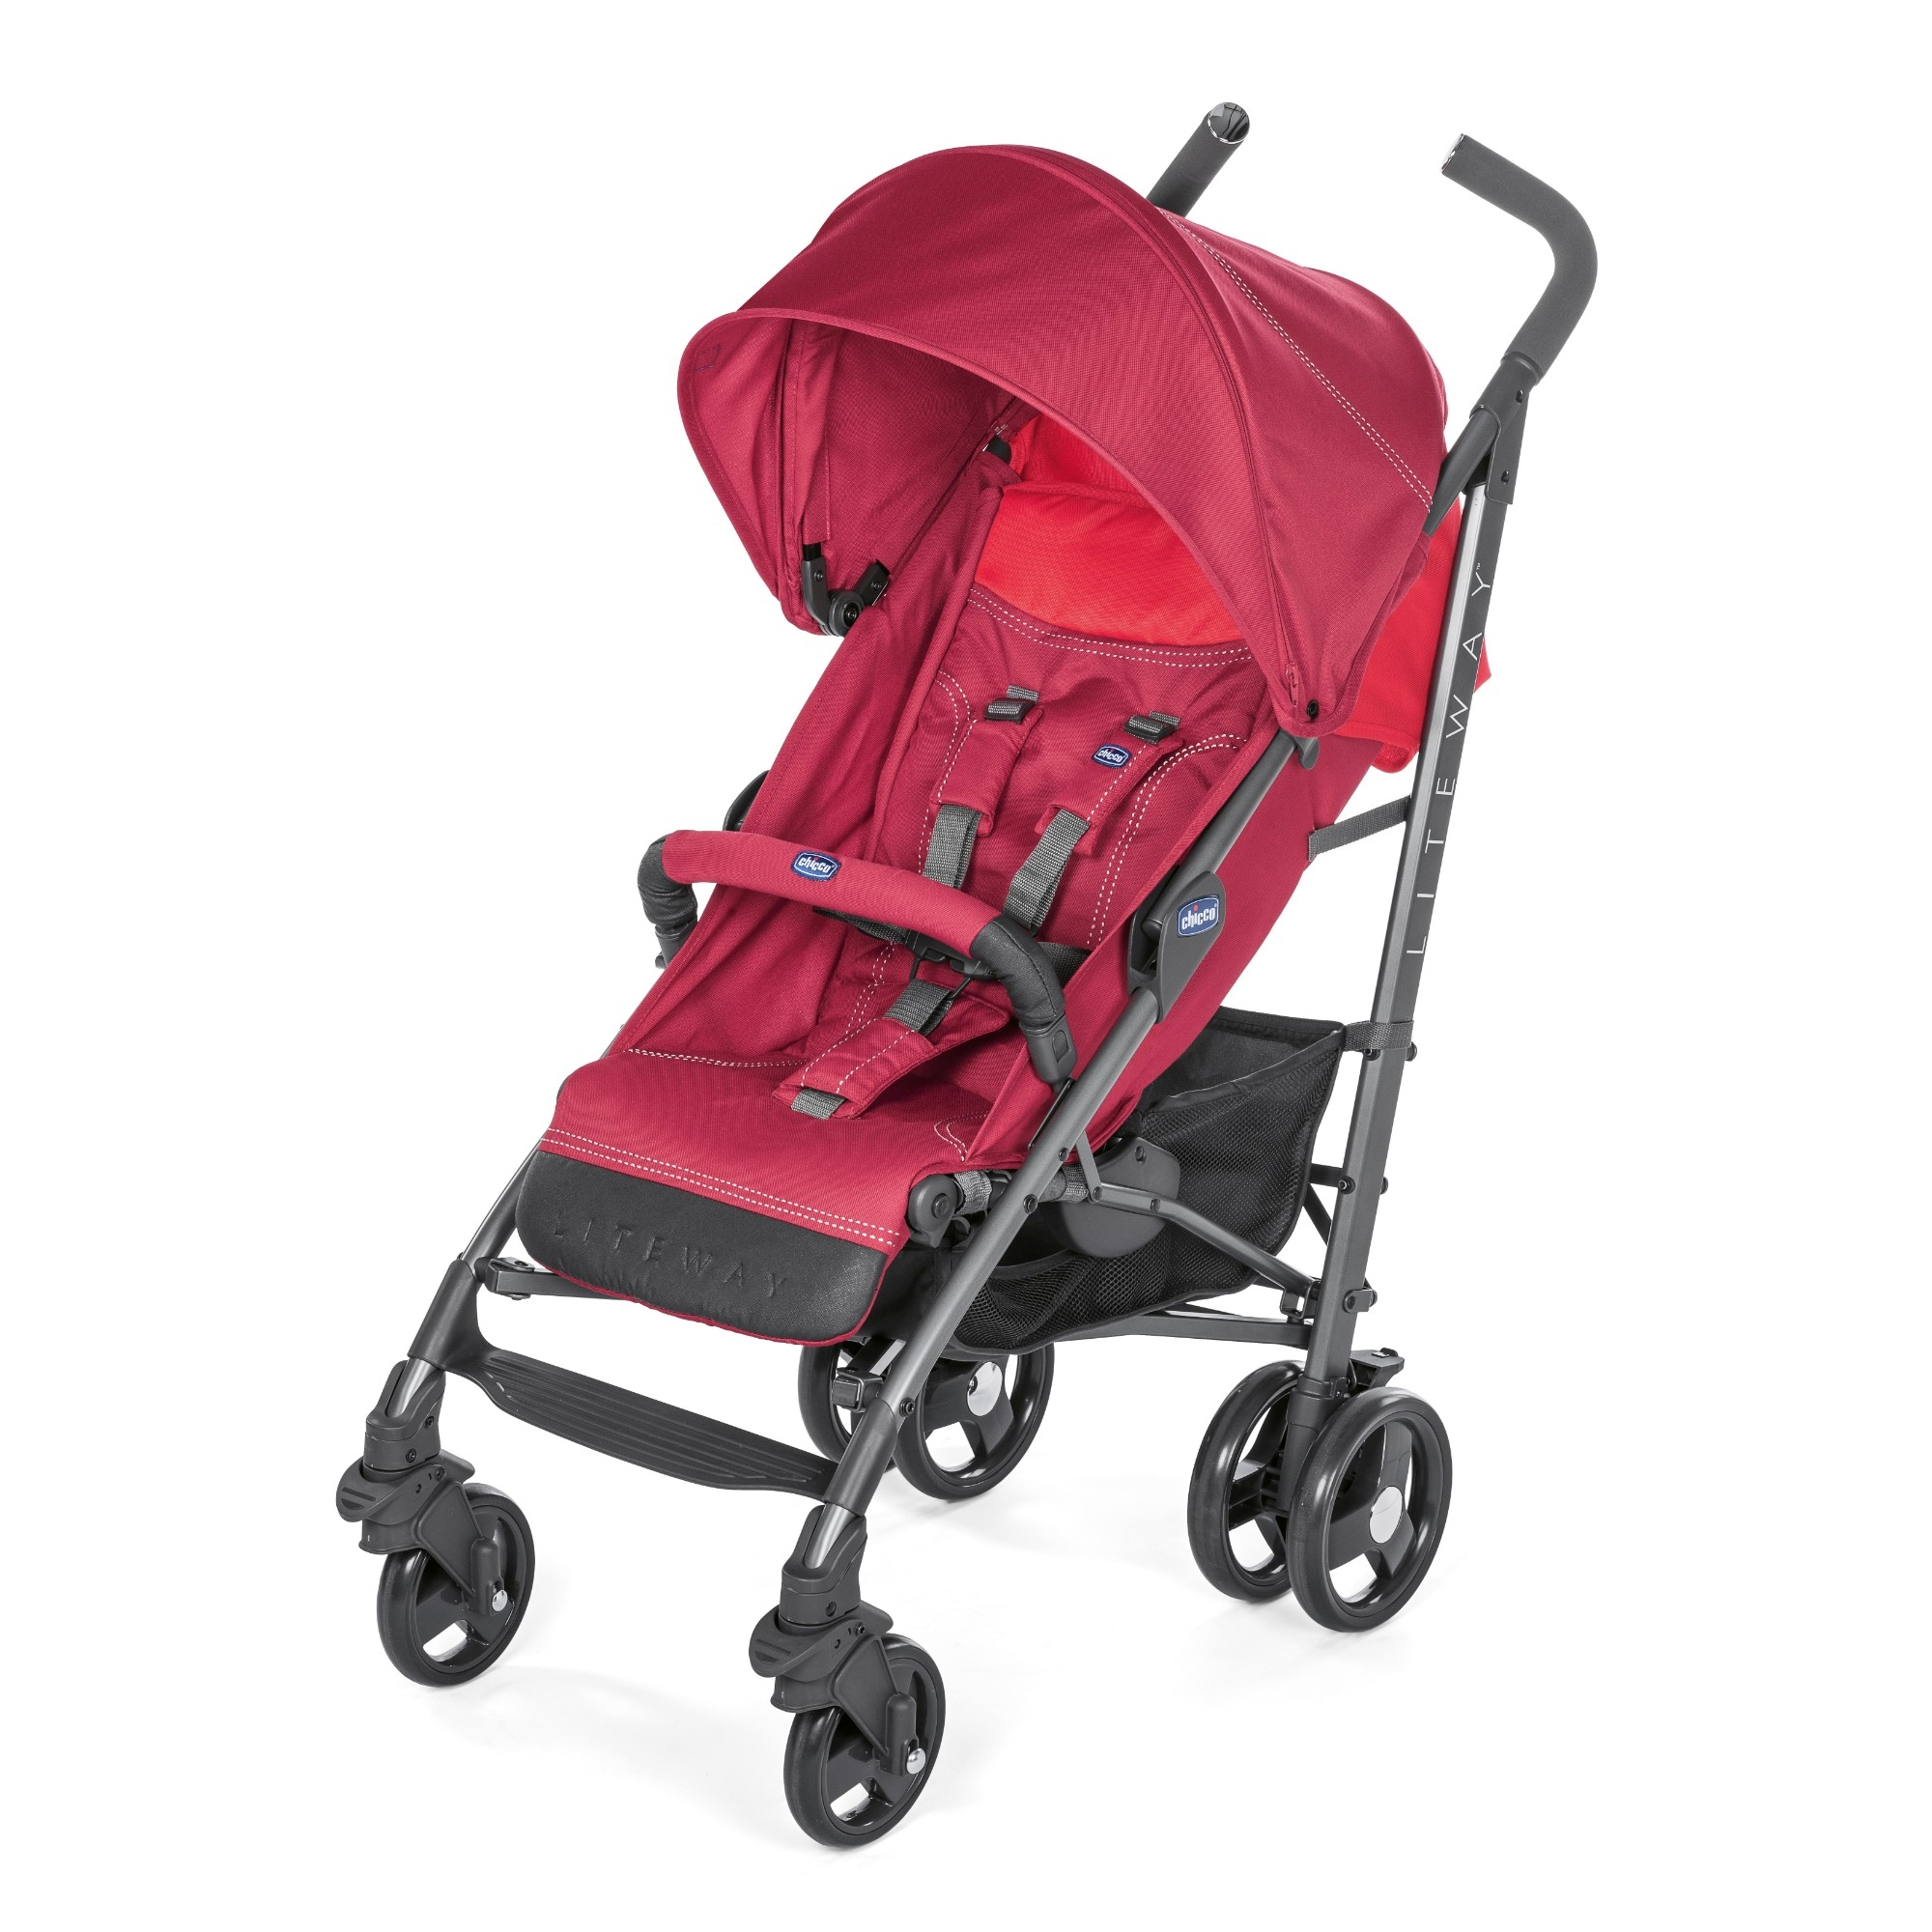 Red Berry Child Kids Pram Stroller Pushchair Chicco LiteWay 3 Baby